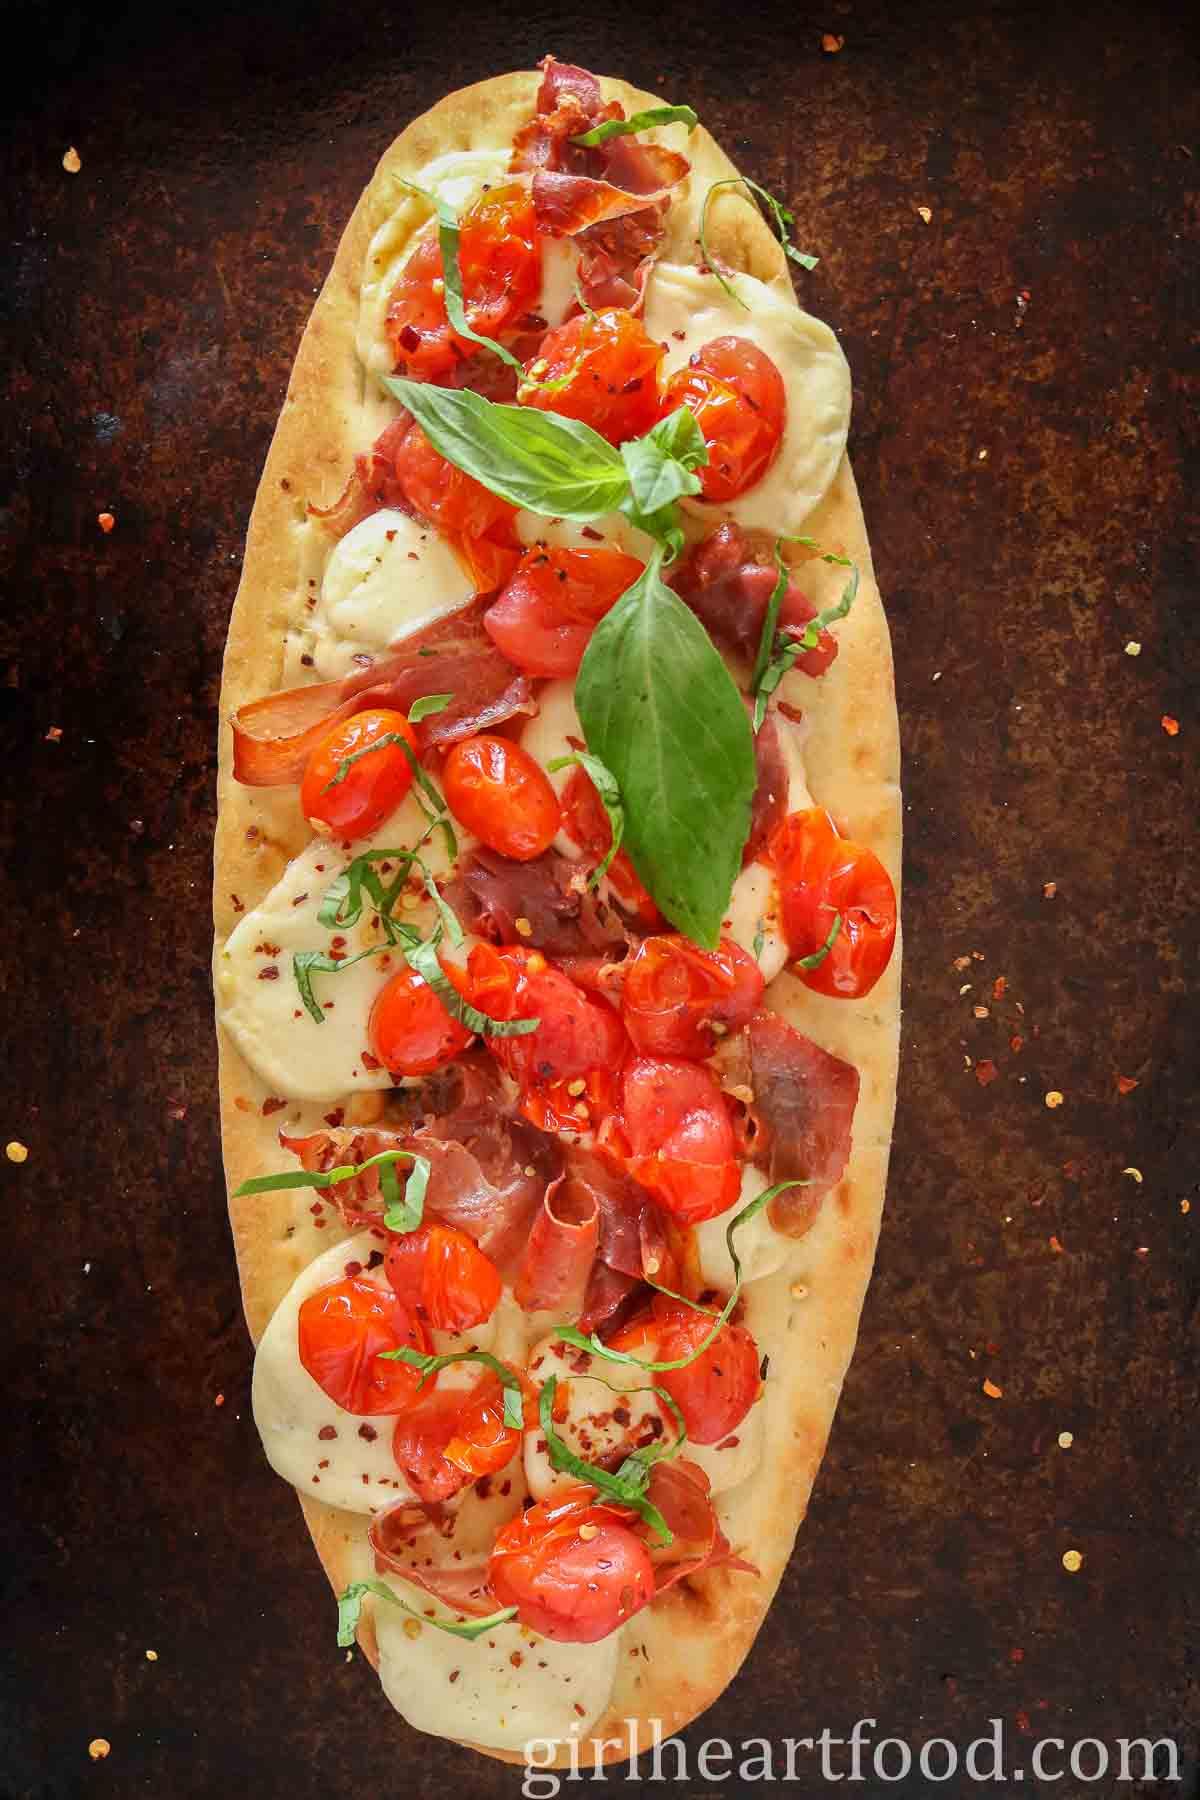 Tomato and prosciutto flatbread pizza on a sheet pan.